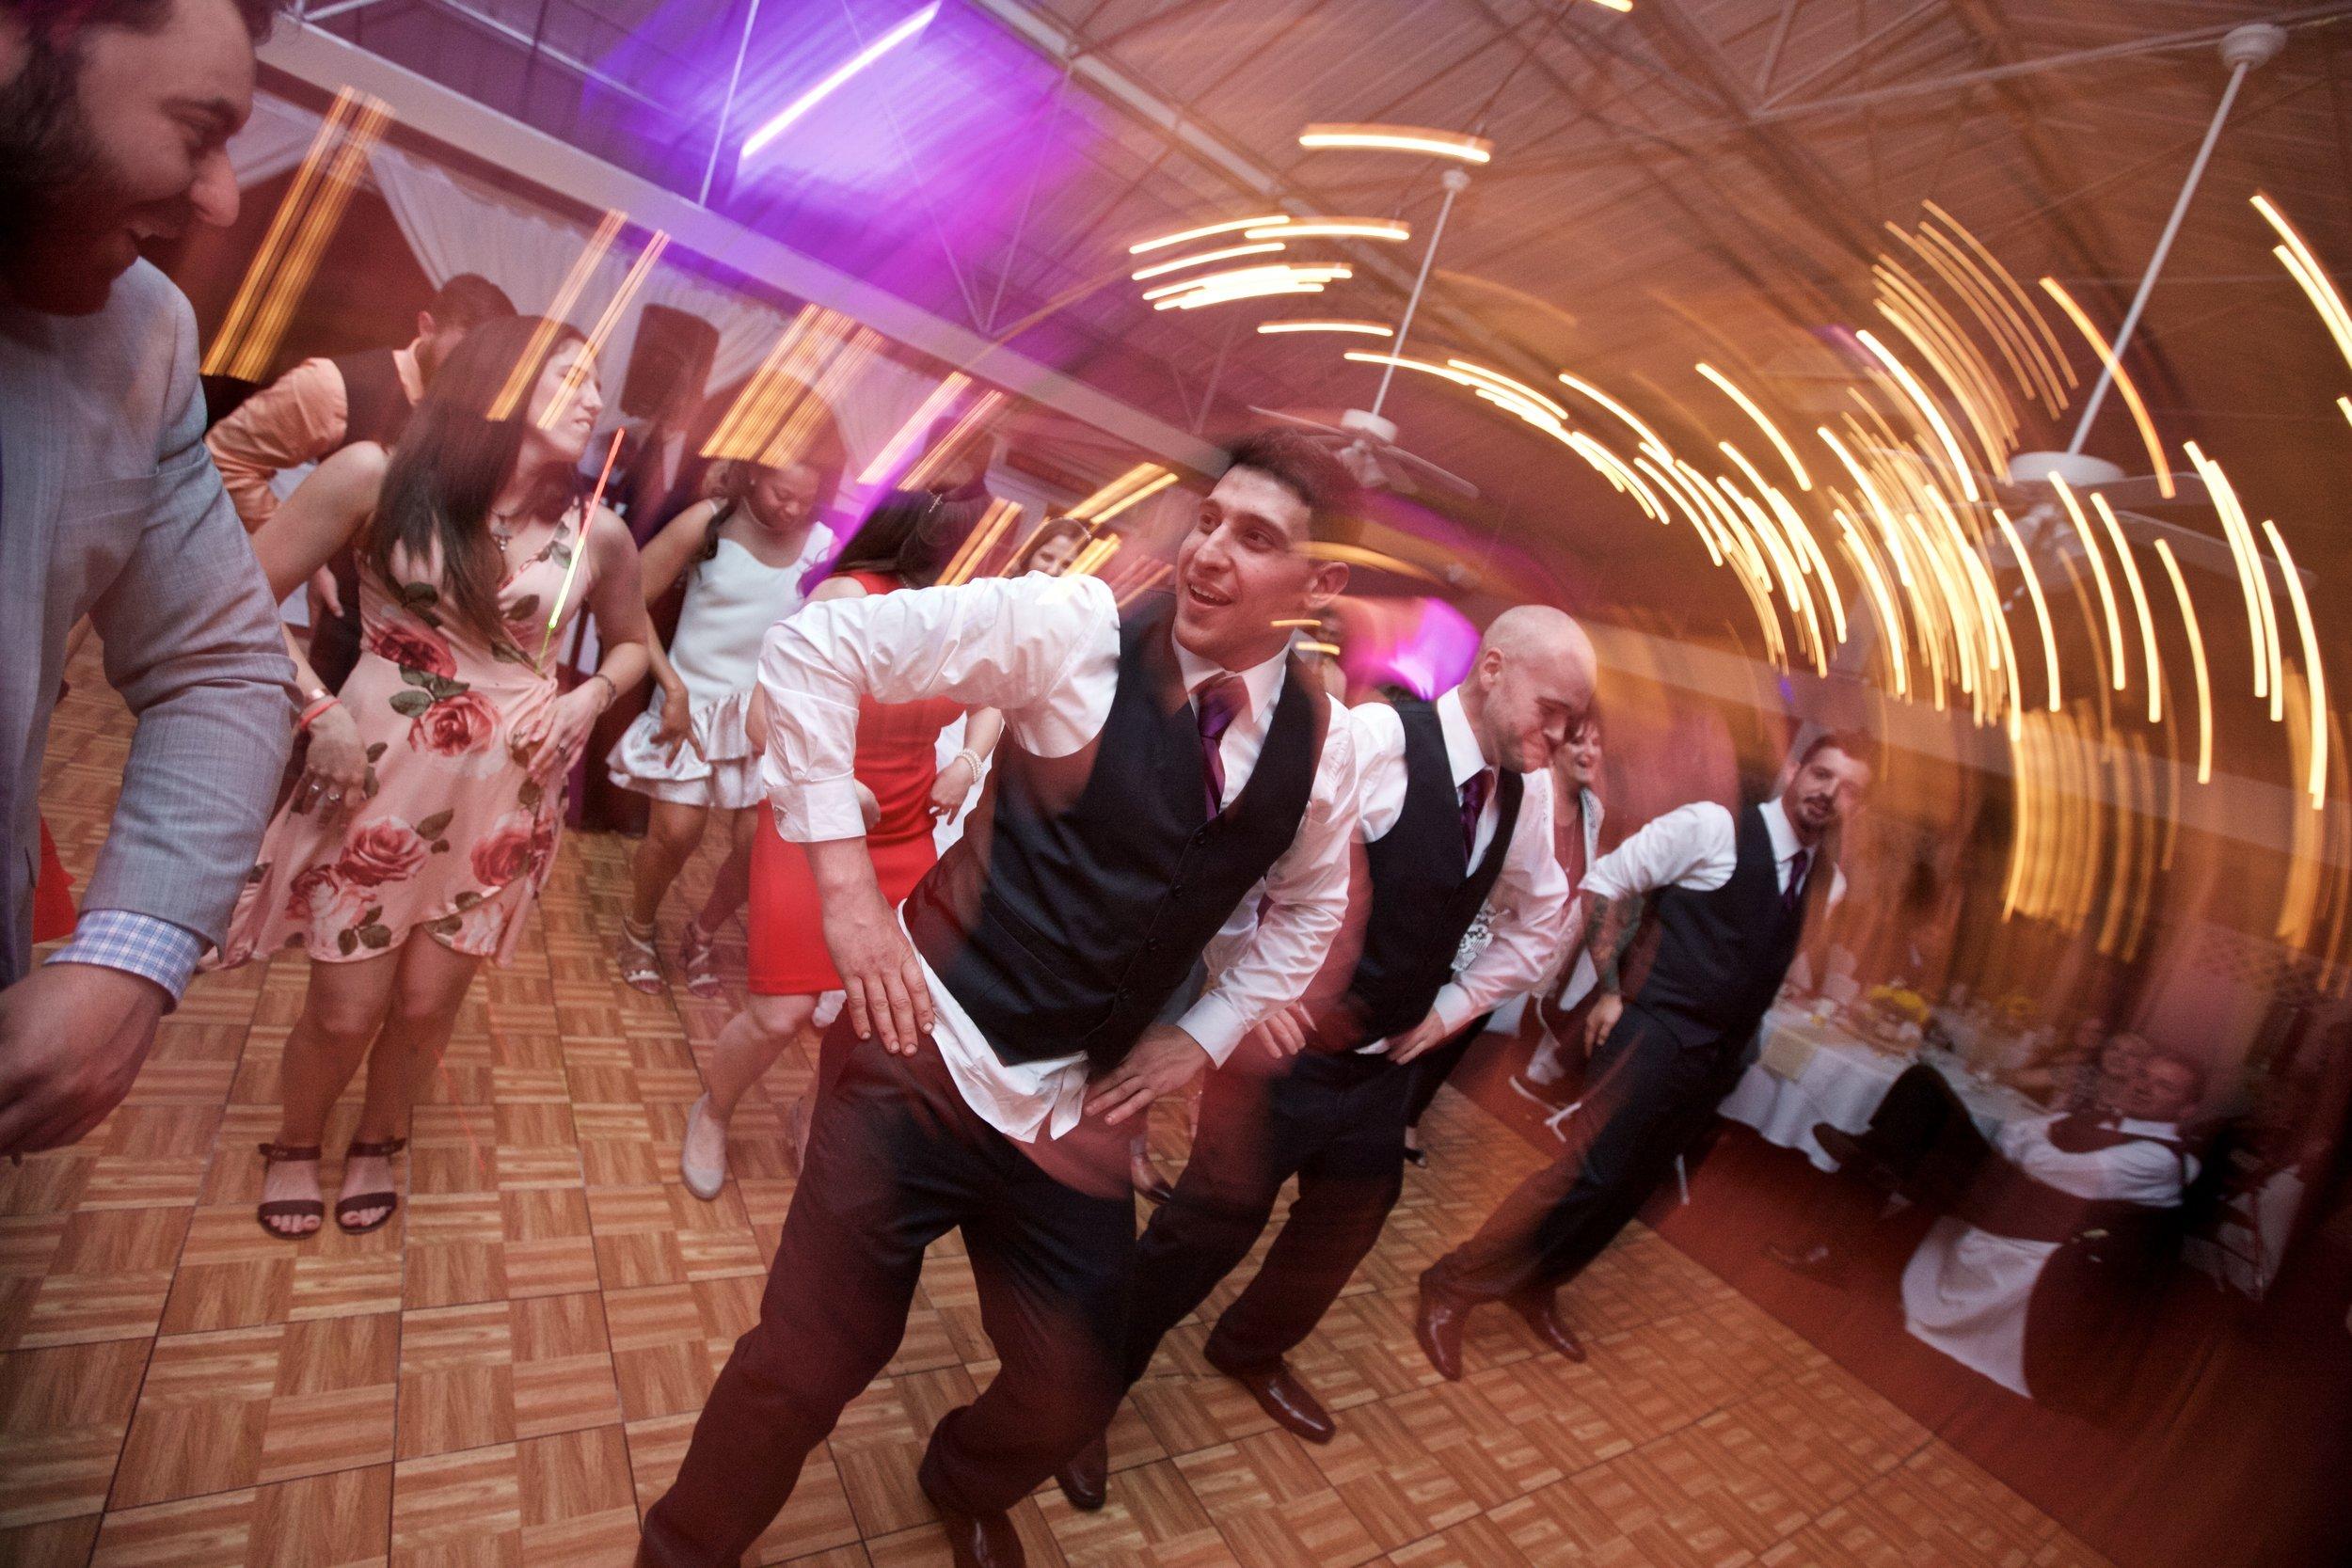 Lippincott manor wedding, wallkill ny wedding, photography, photos i.jpg